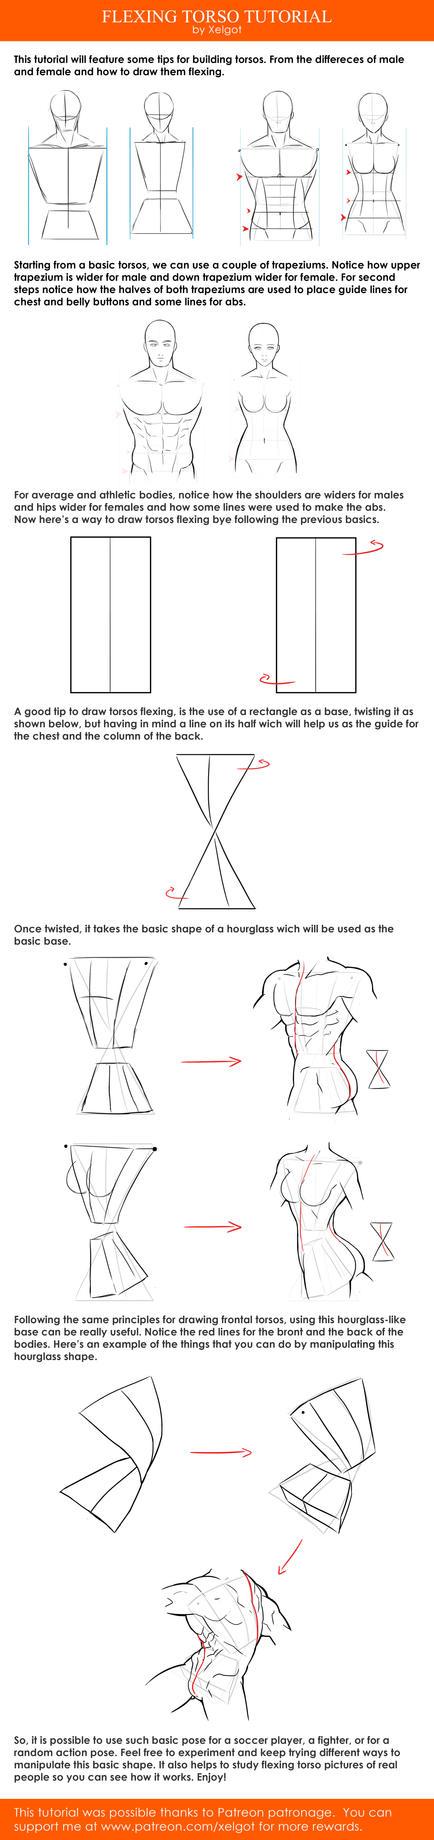 Flexing Torso tutorial by Xelgot